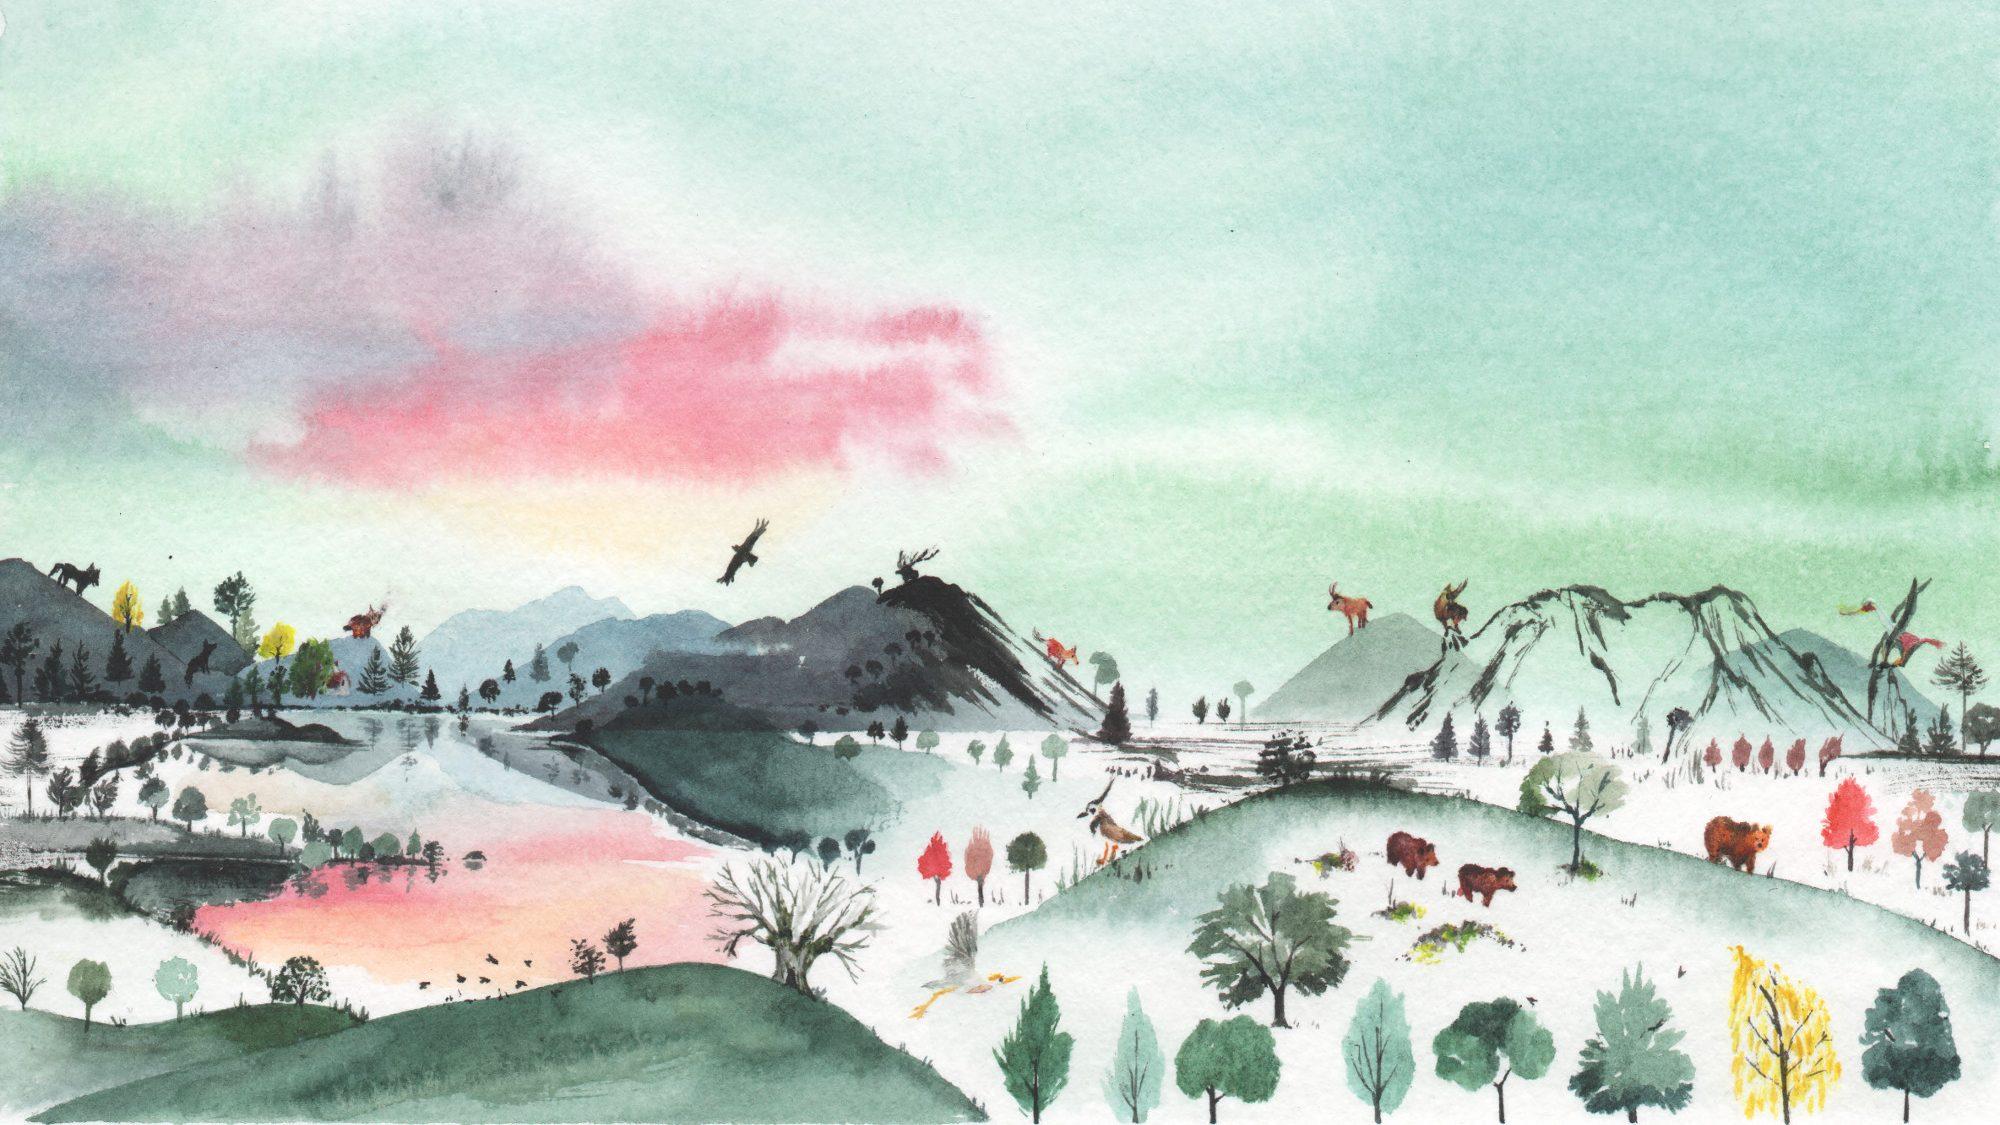 Watercolour landscape in Parco Nazionale d'Abruzzo for a calendar